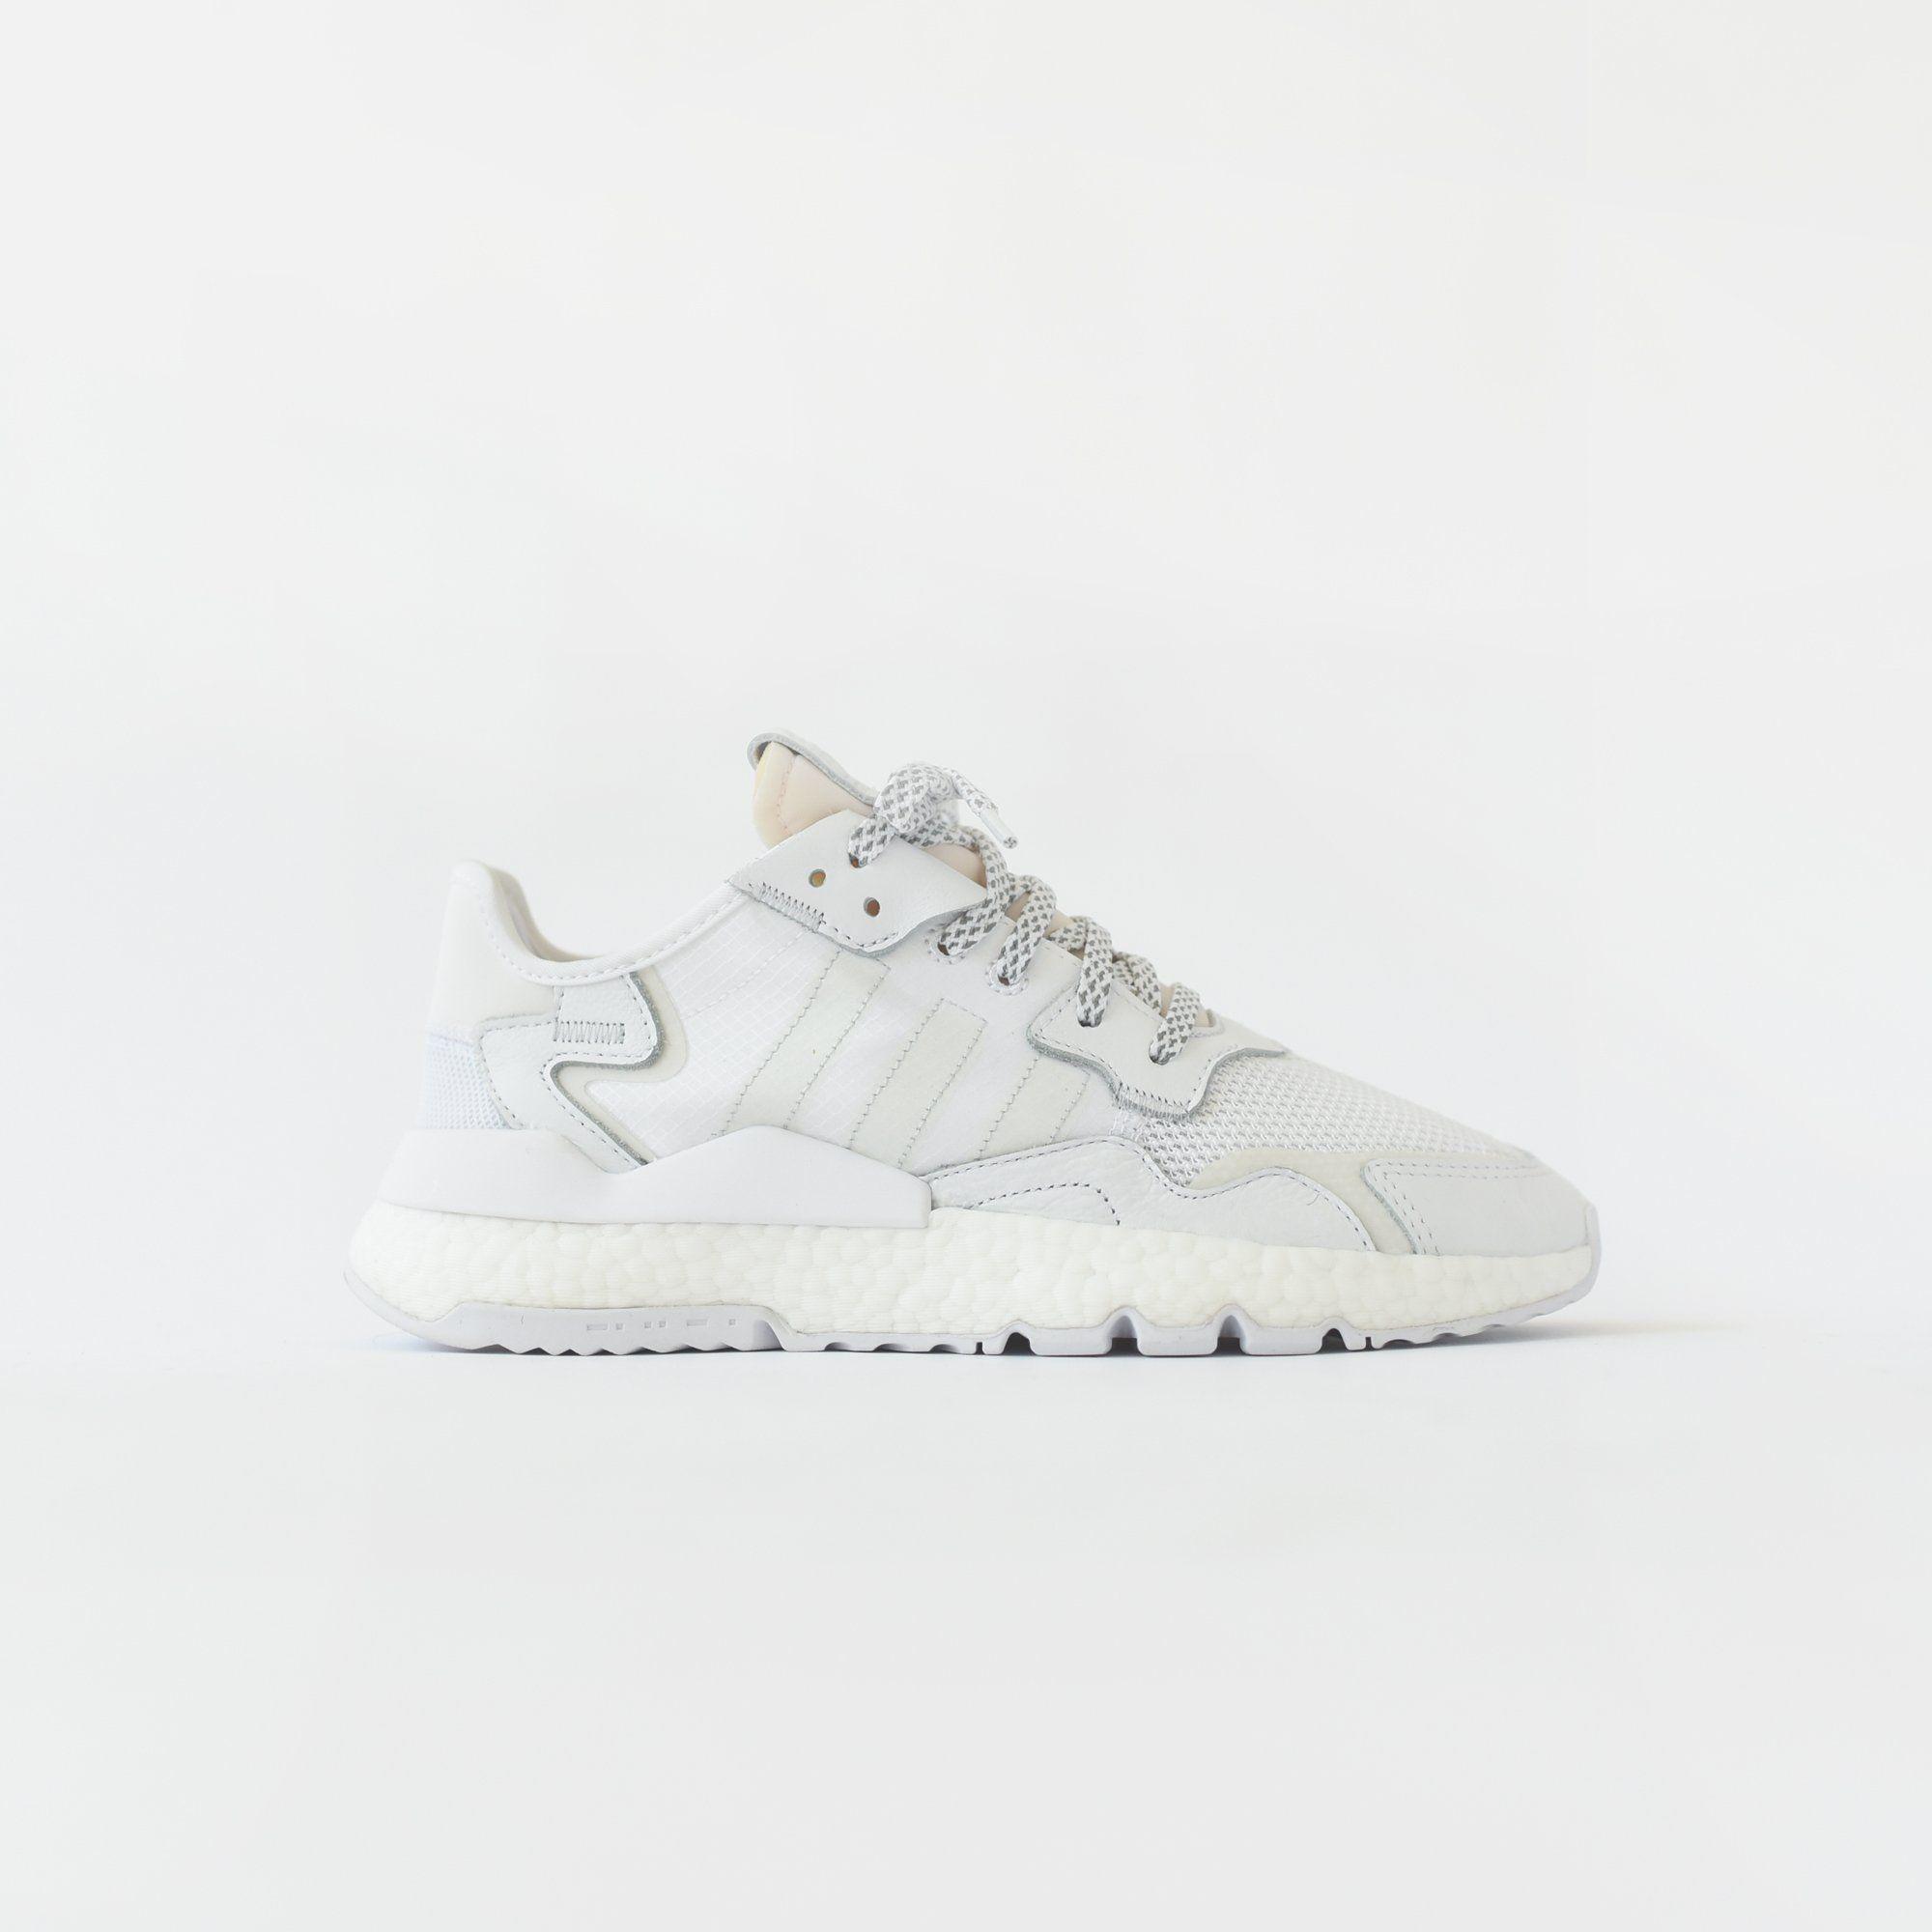 brand new 40987 0dd34 adidas Originals Nite Jogger Boost - White   Crystal White   Grey – Kith